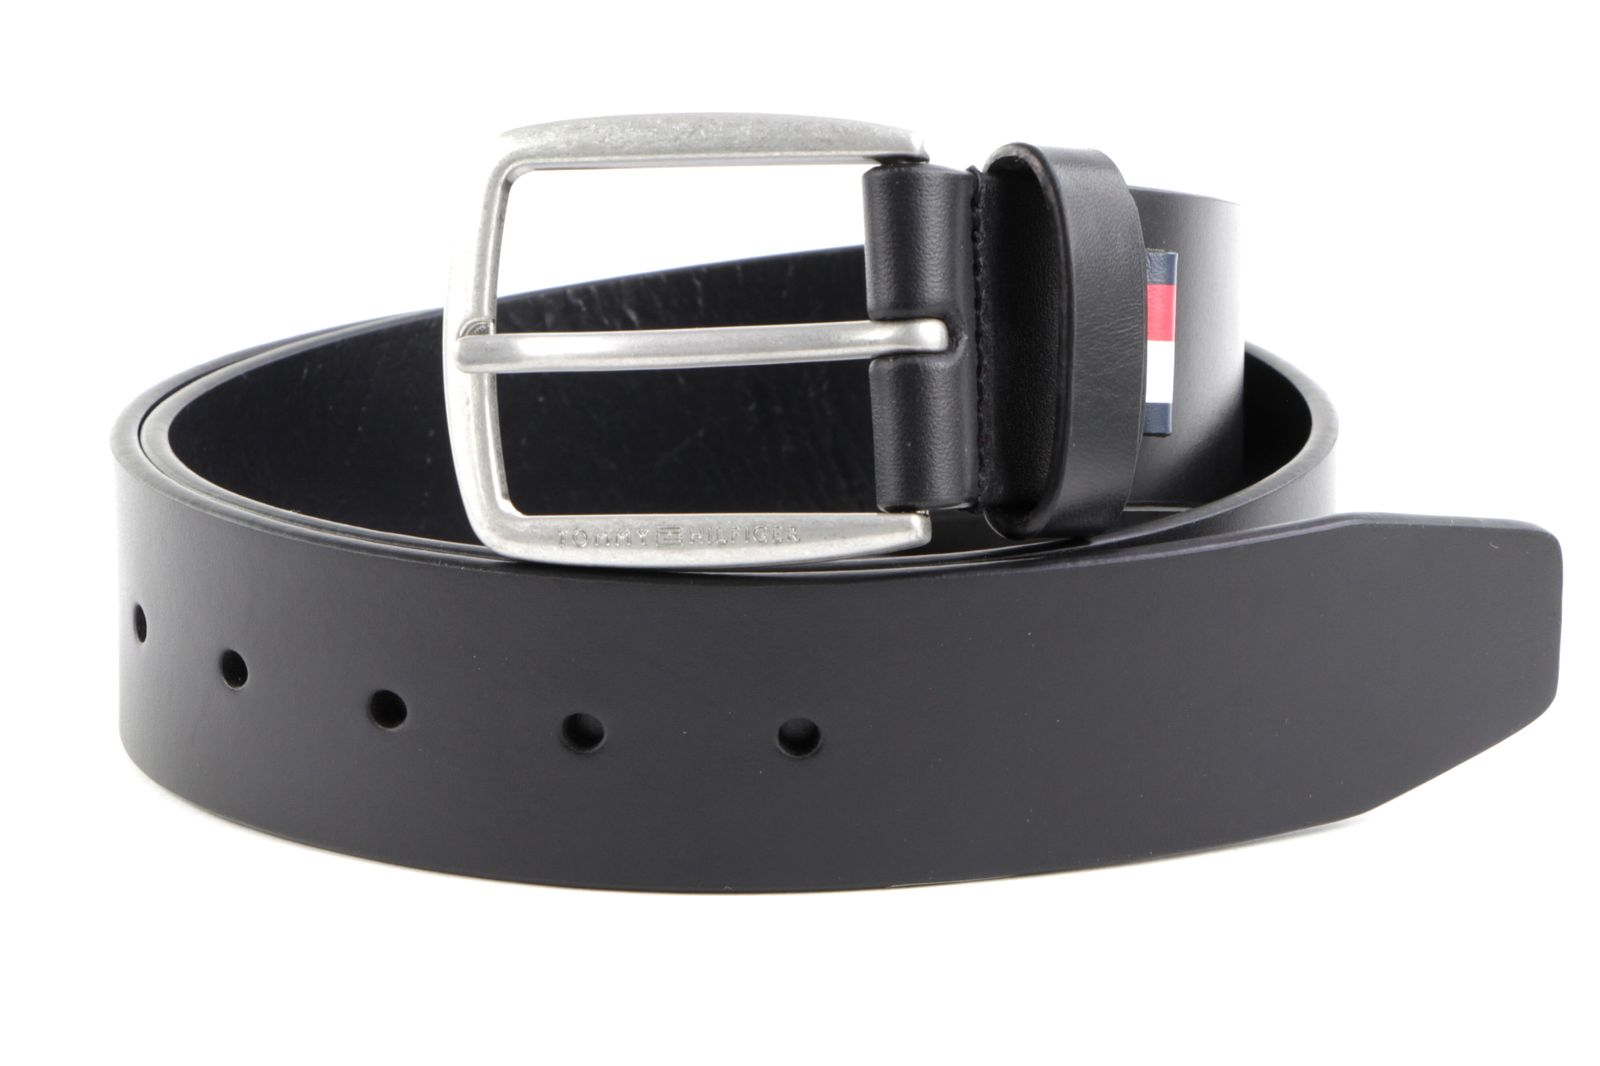 TOMMY HILFIGER Modern Leather Belt 4.0 W95 Black